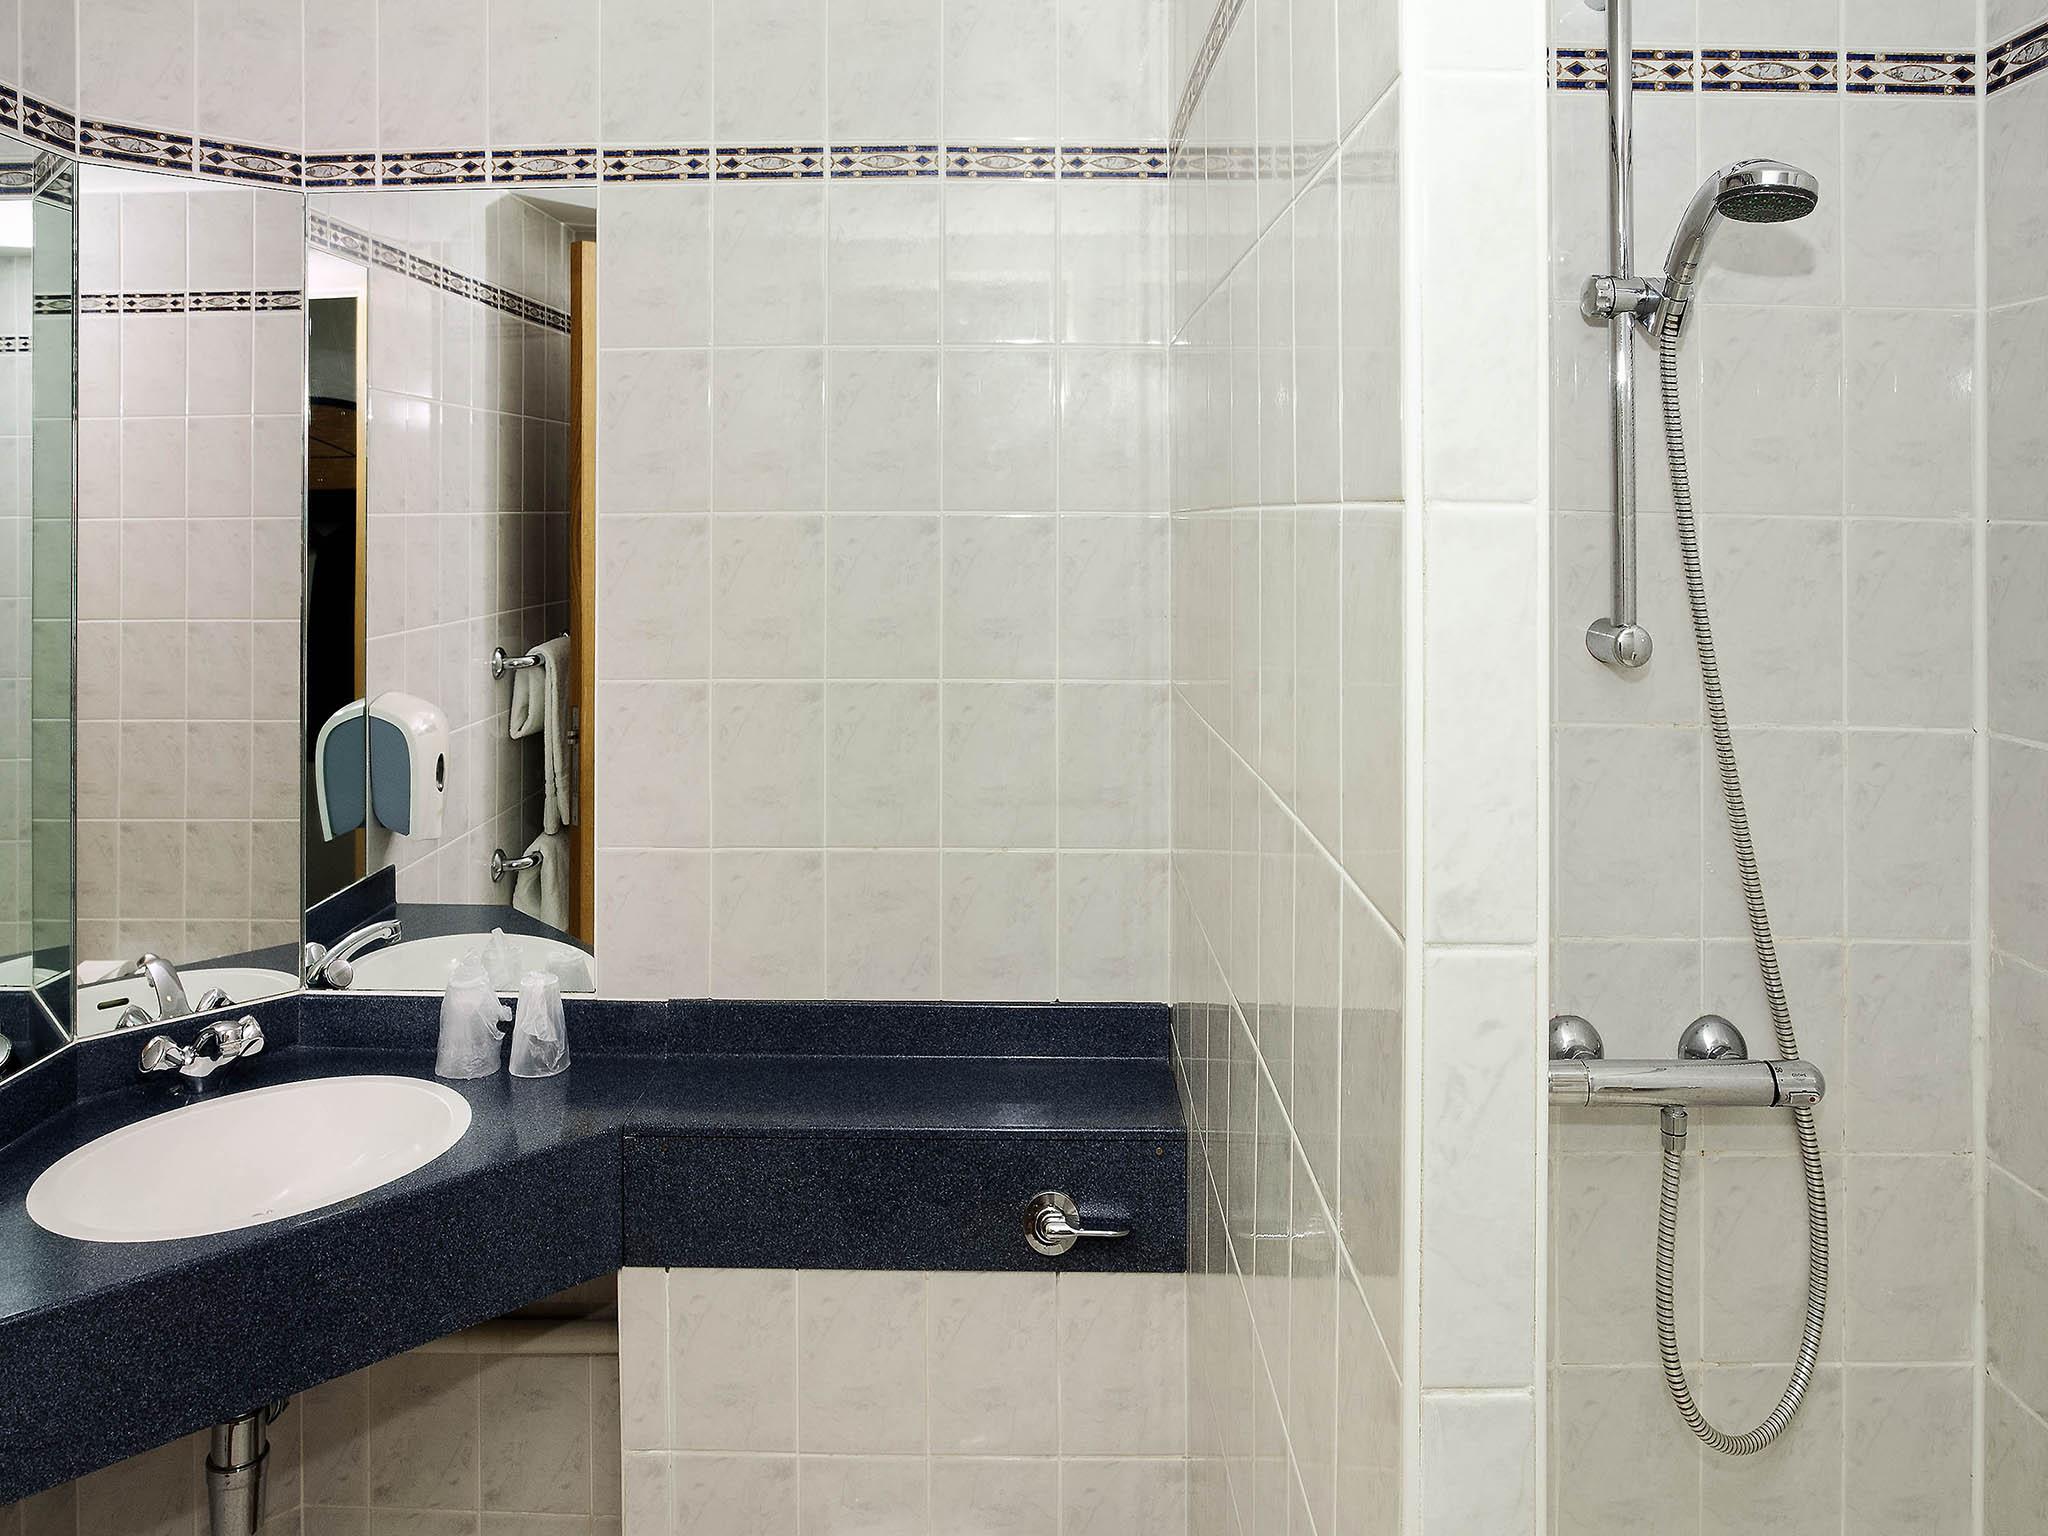 Ibis Cardiff Gate | Comfortable & Modern Hotel in Cardiff